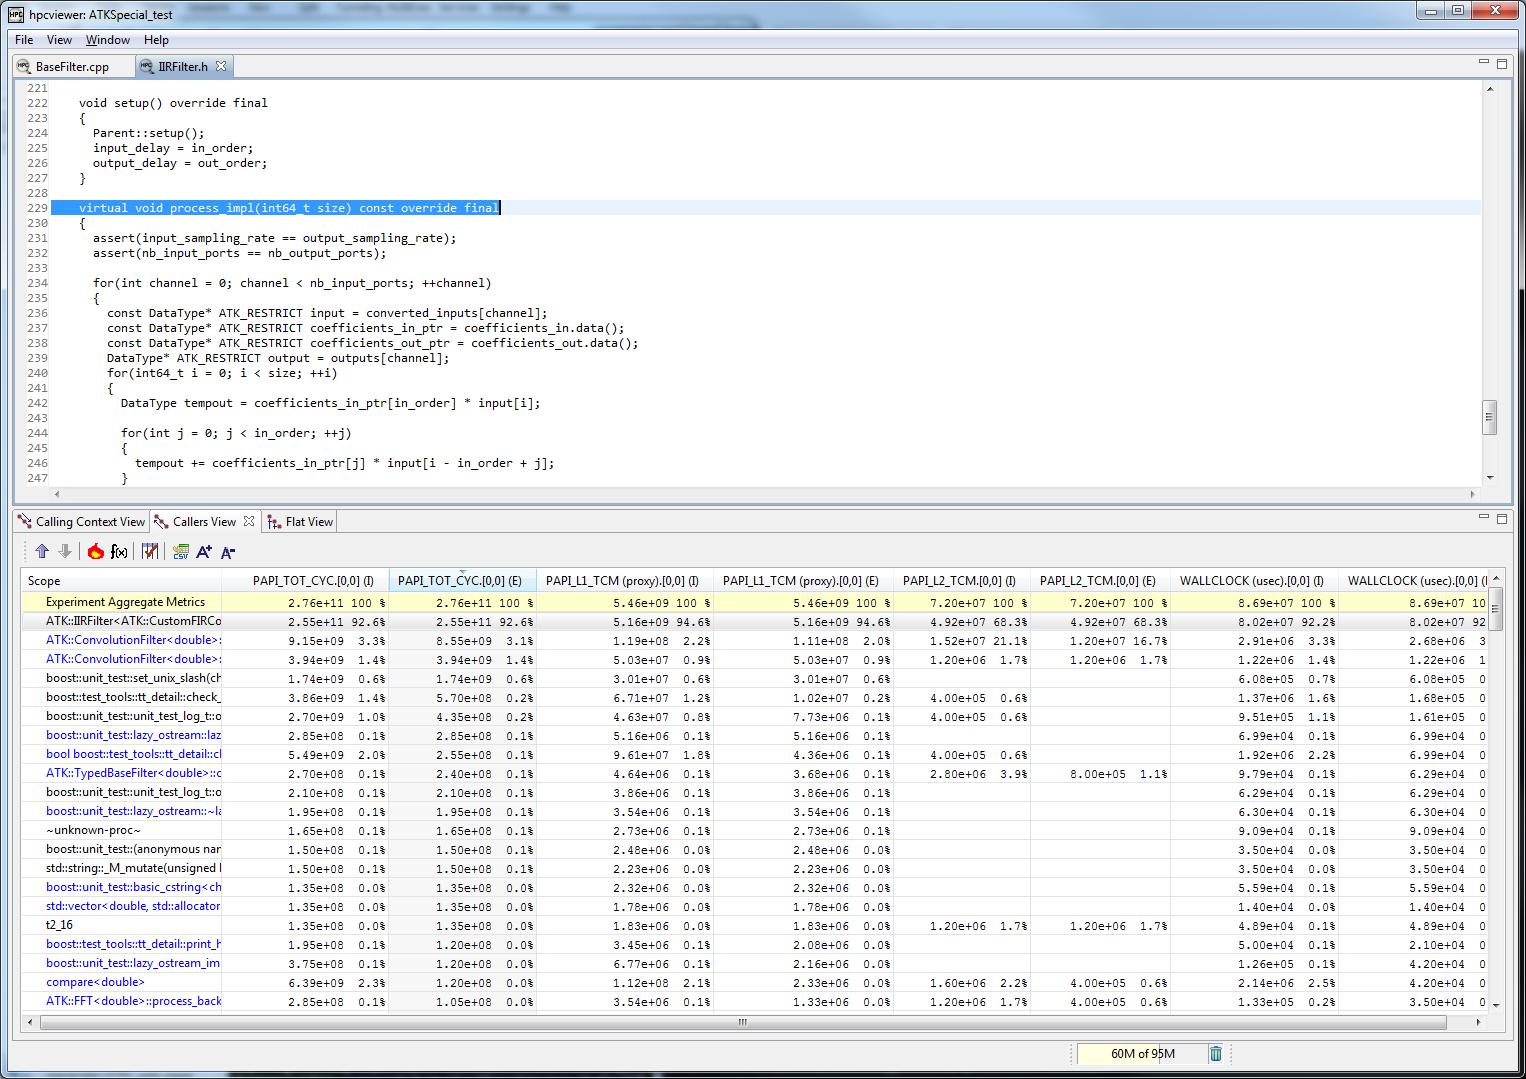 HPCViewer main window